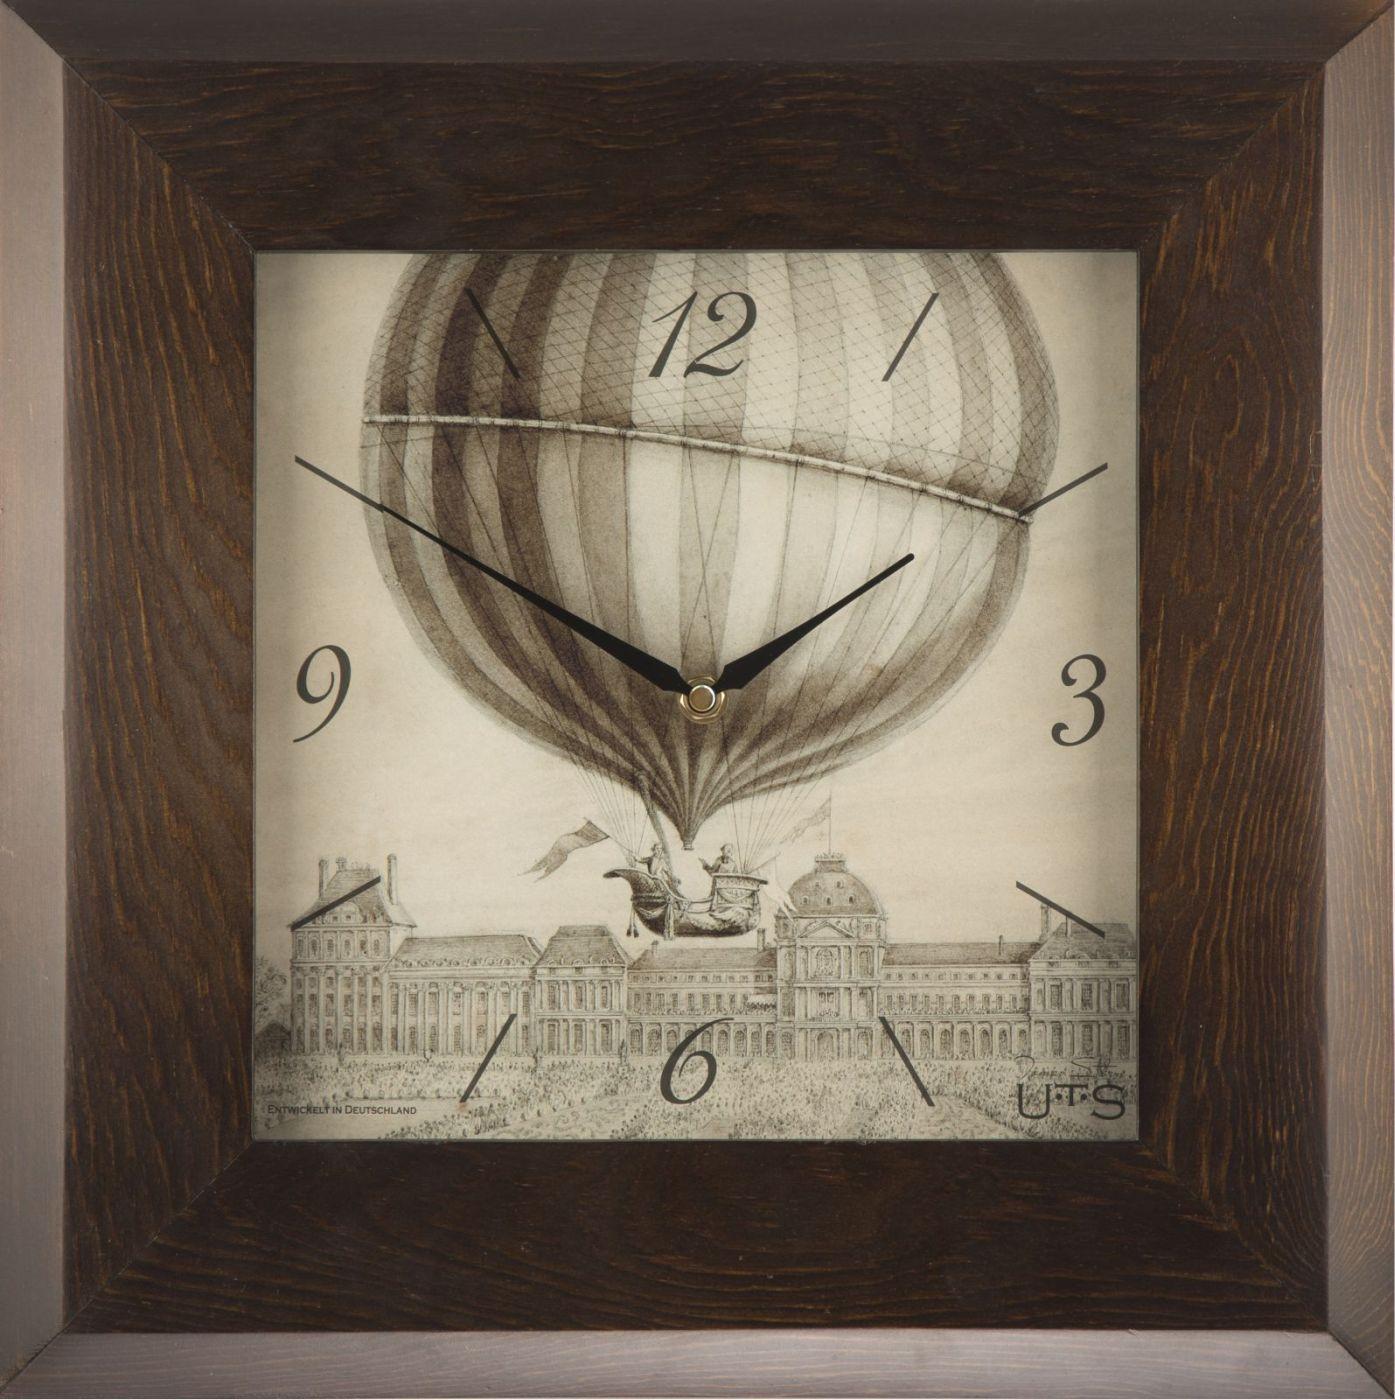 Часы настенные Часы настенные Tomas Stern 7006 chasy-nastennye-tomas-stern-7006-germaniya-tayvan.jpg